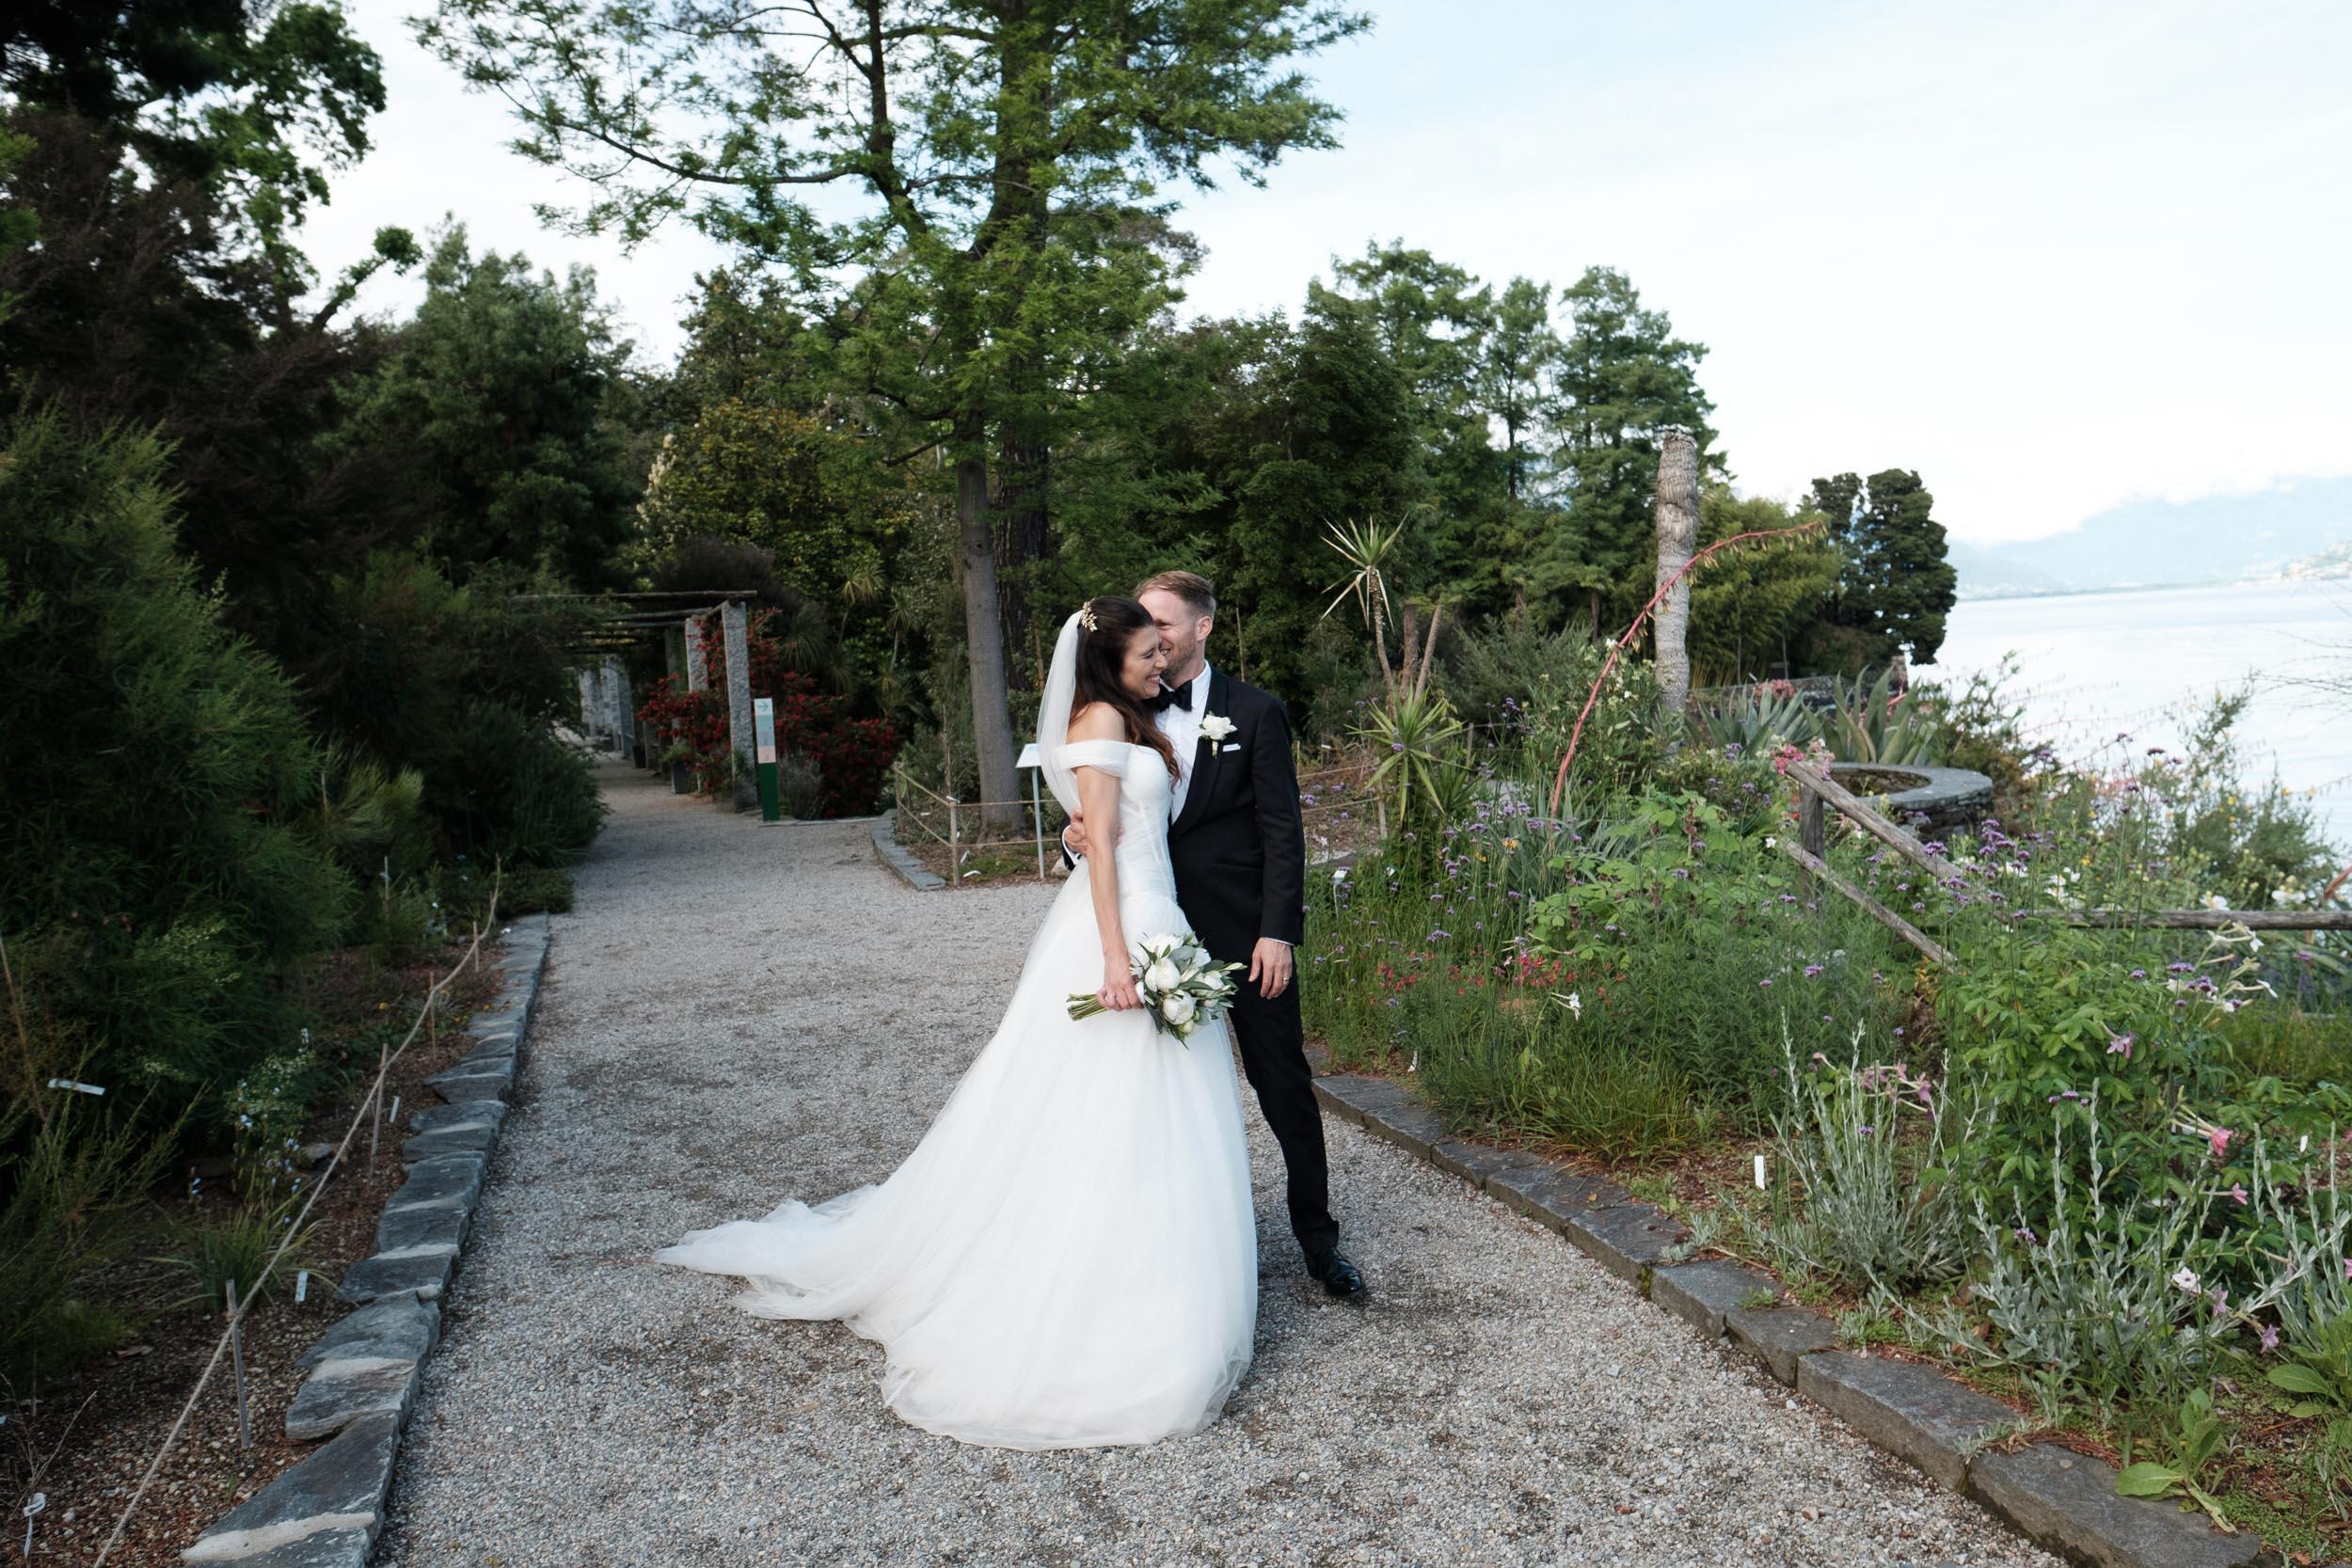 olivia-andreas-wedding-switzerland-397.jpg